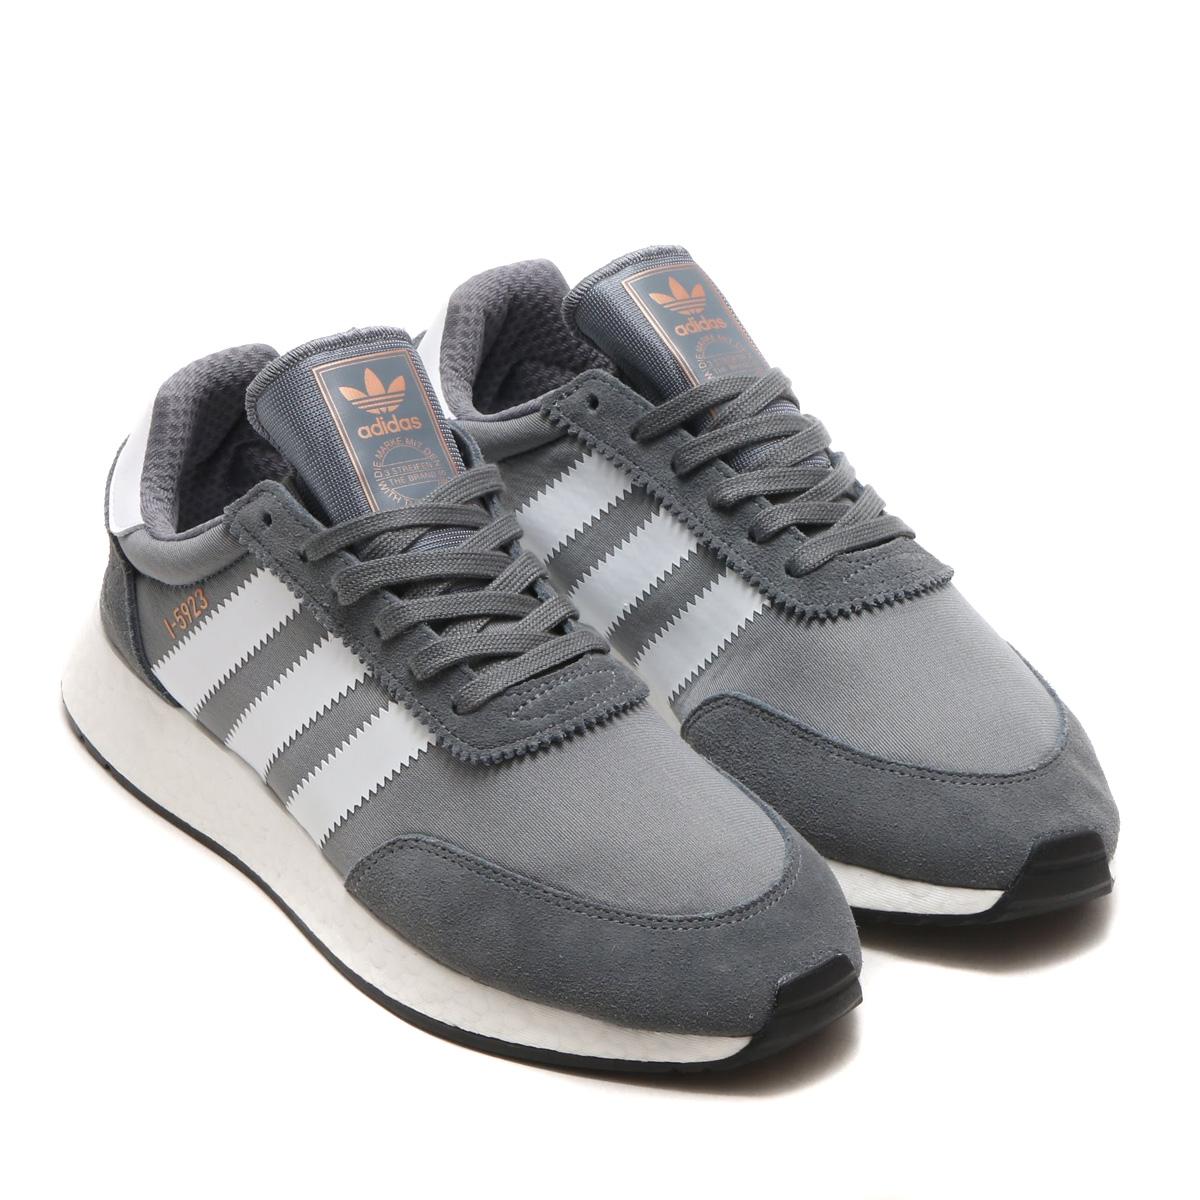 adidas Originals INIKI RUNNER(アディダス オリジナルス イニキ ランナー)Vista Grey/Footwear White/Core Black【メンズ レディース】18SS-I